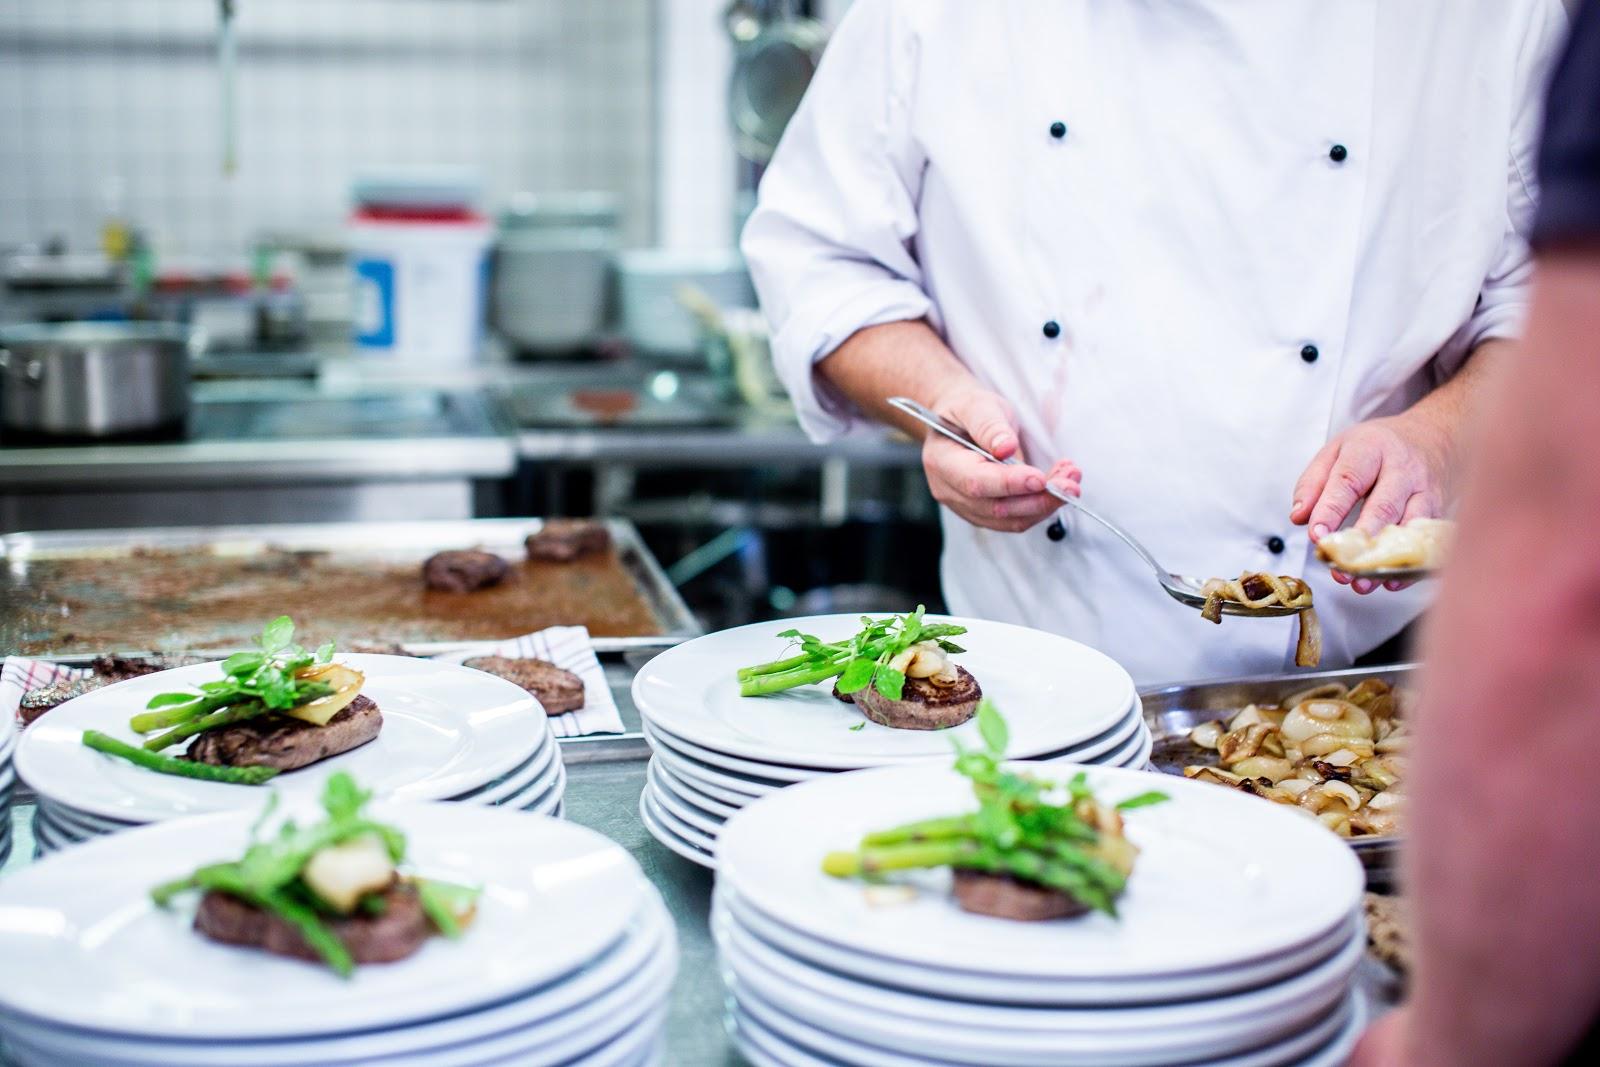 Alex Canter's Top 100 Restaurants for 2021